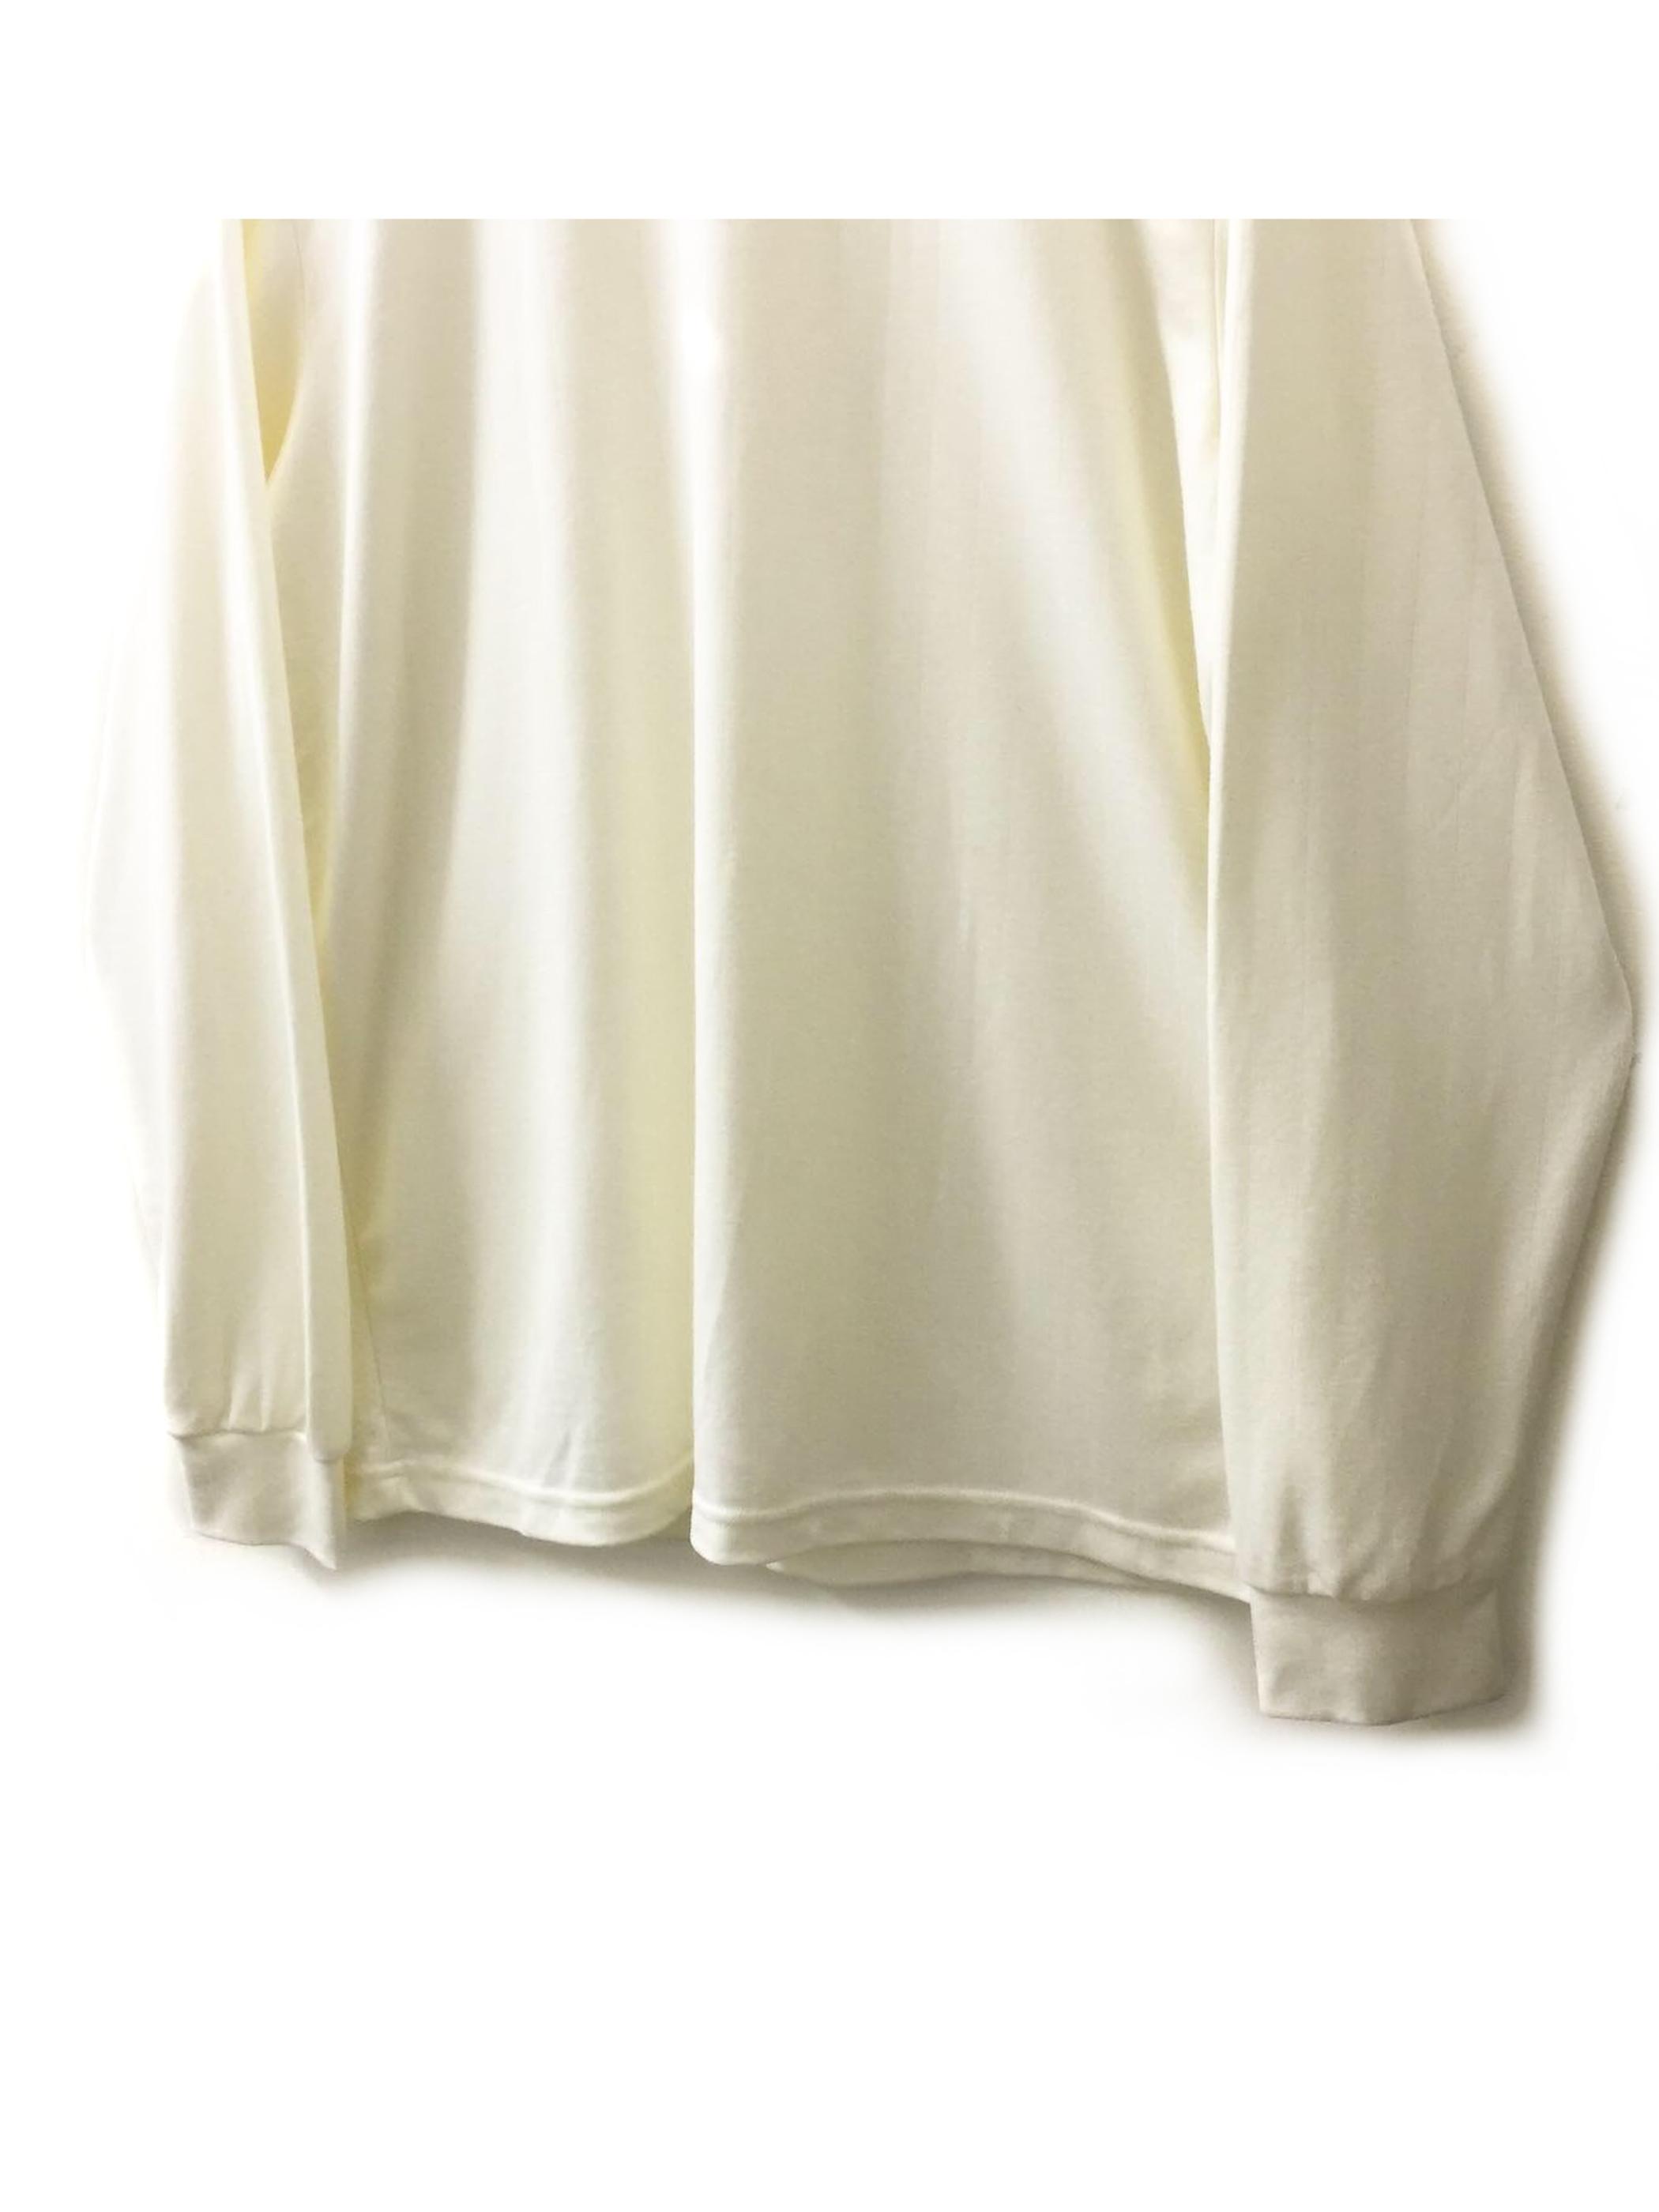 Tricolore モックネック カットソー ホワイト色